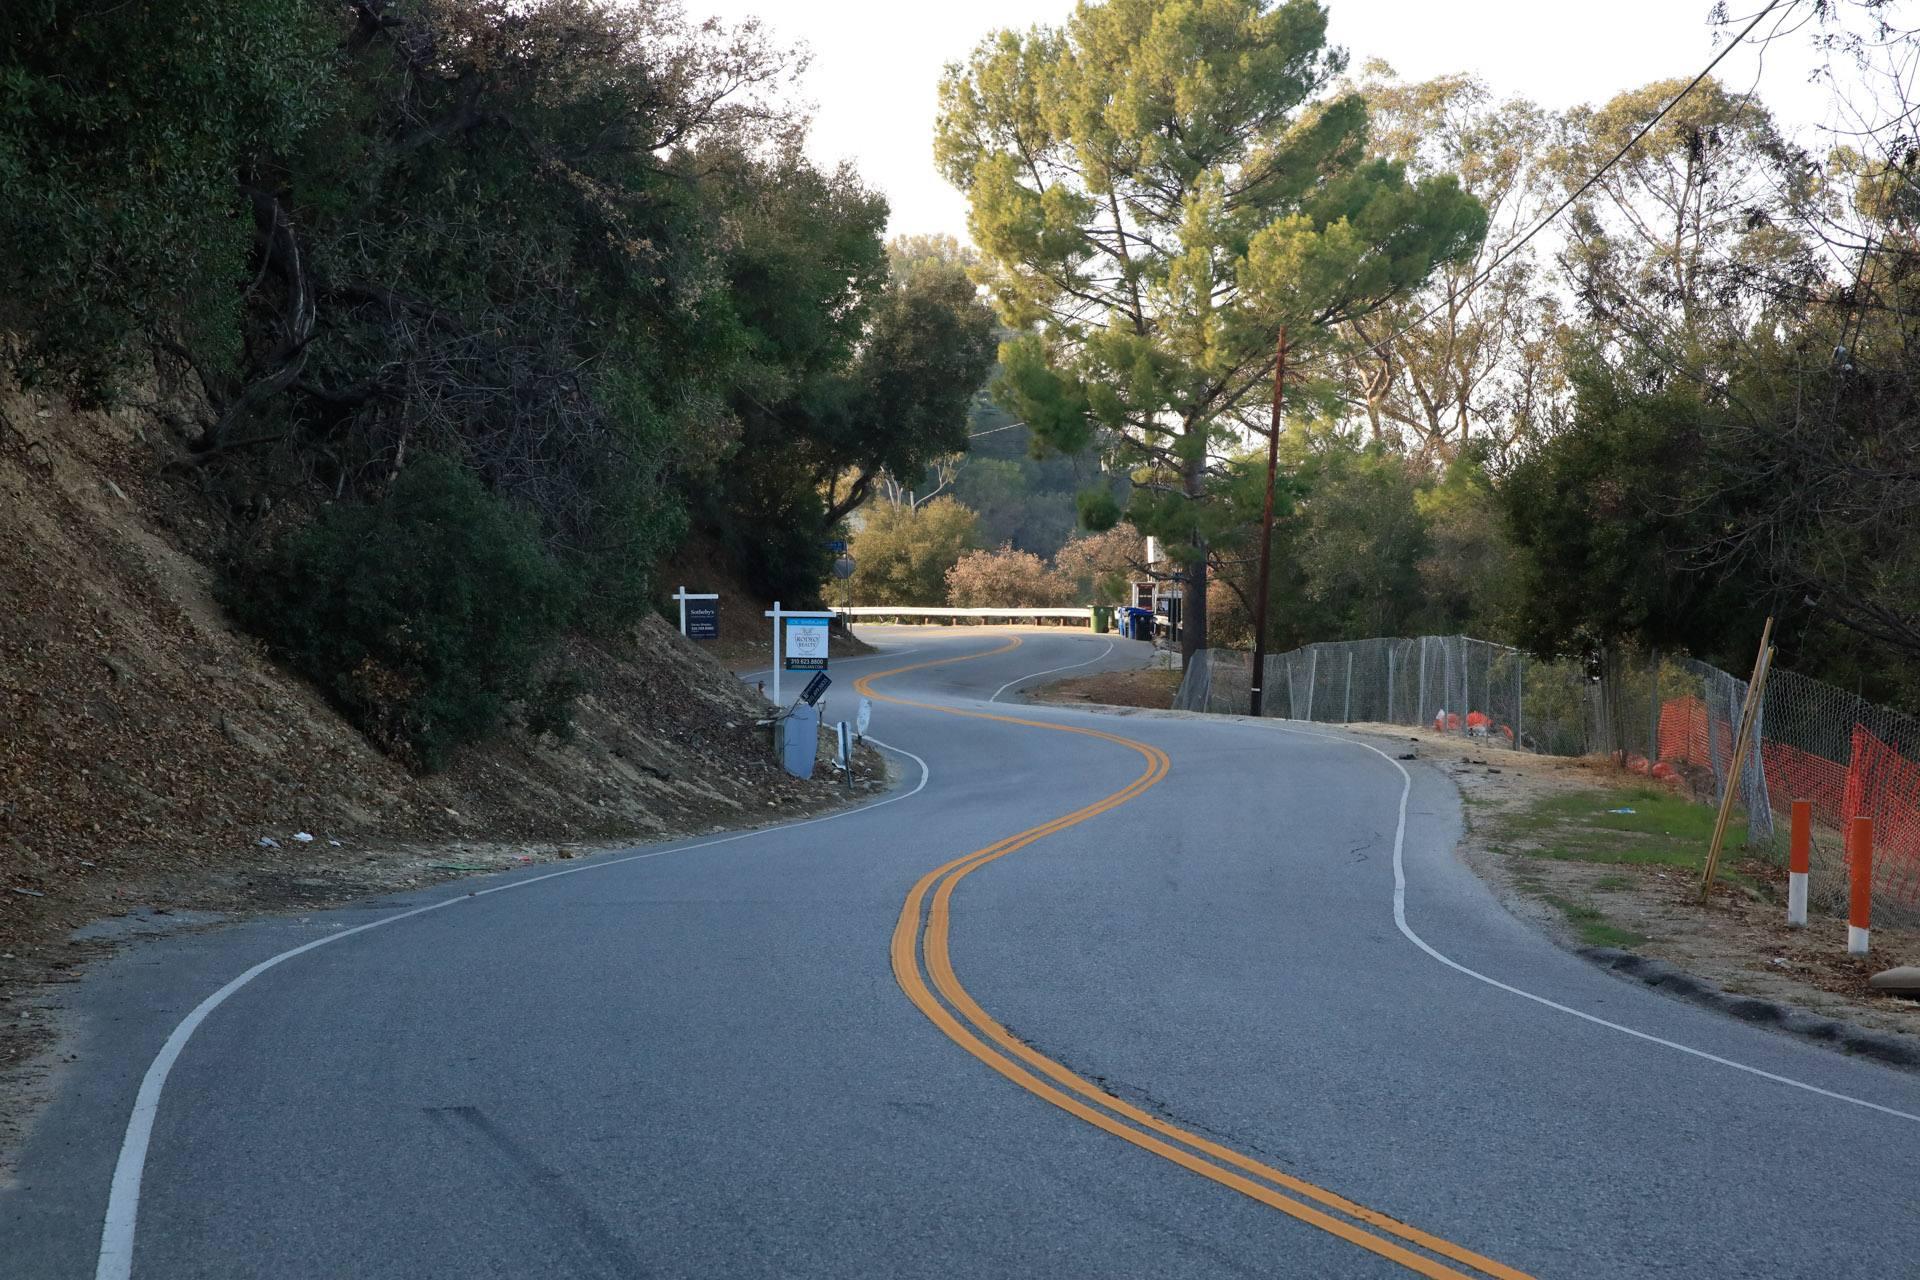 Mulholland Drive